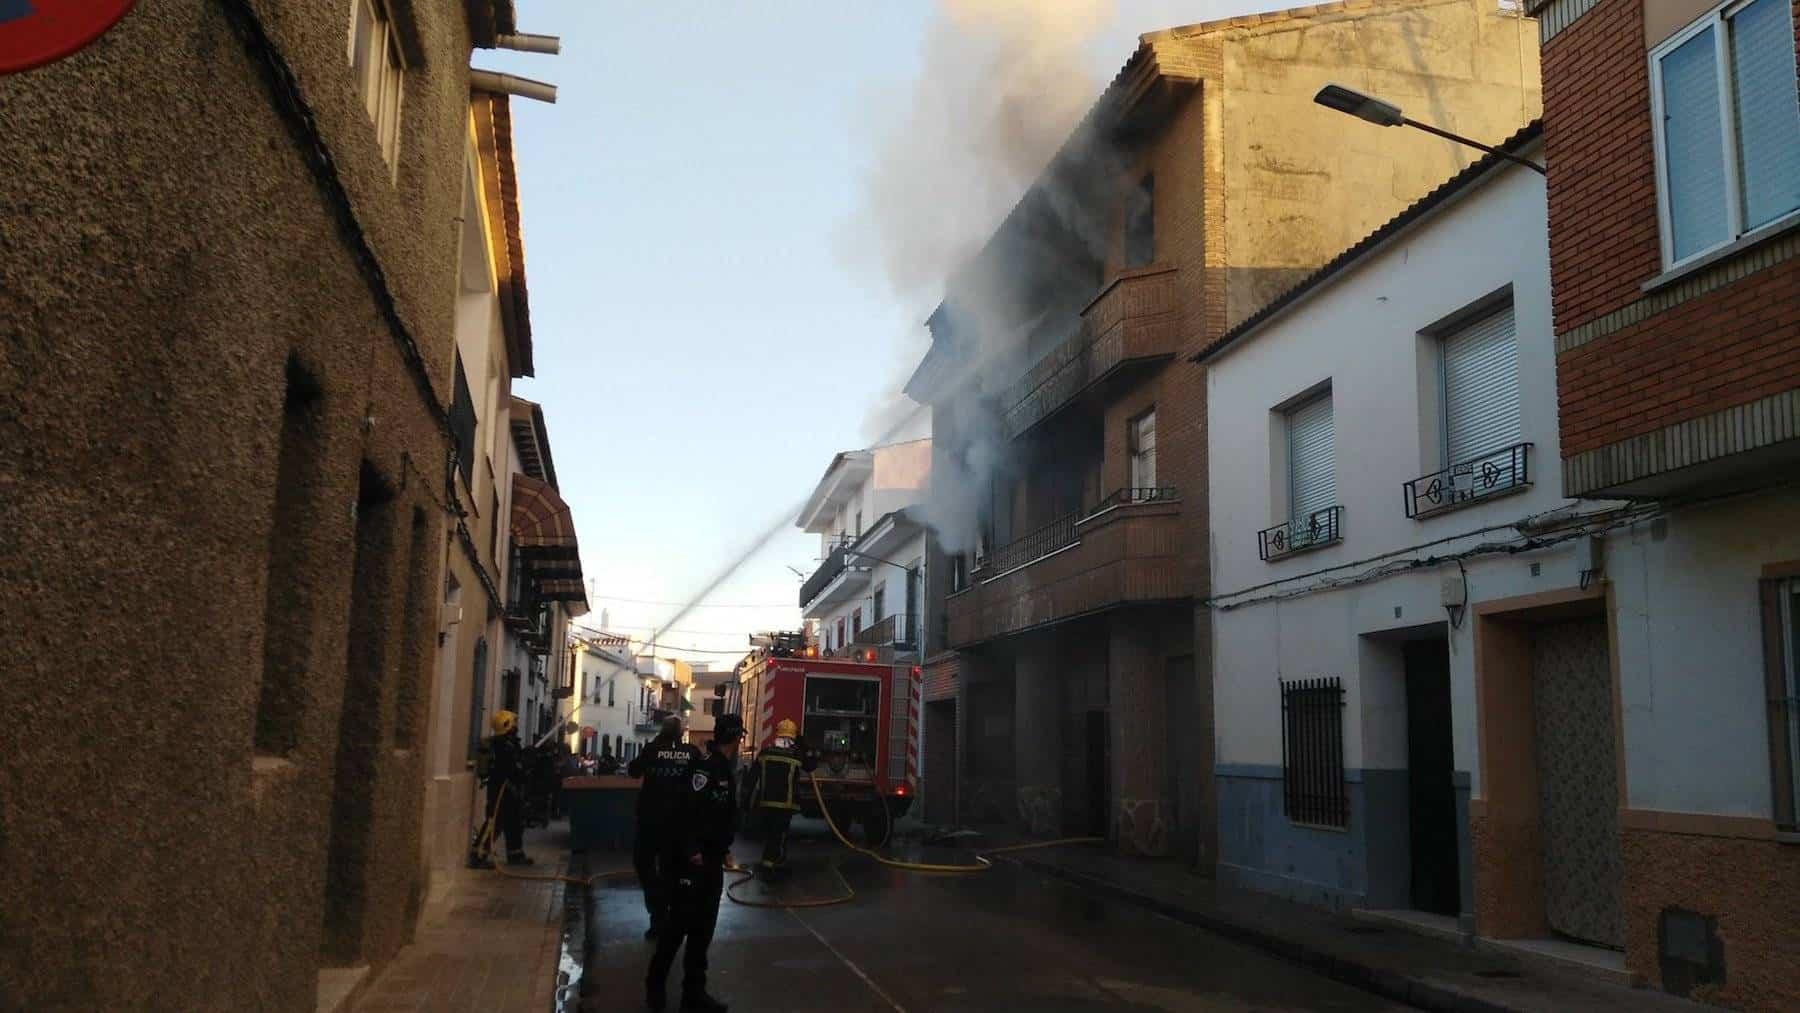 bomberos incendio calle tahona herencia 1 - Declarado un incendio en la Calle Tahona de Herencia